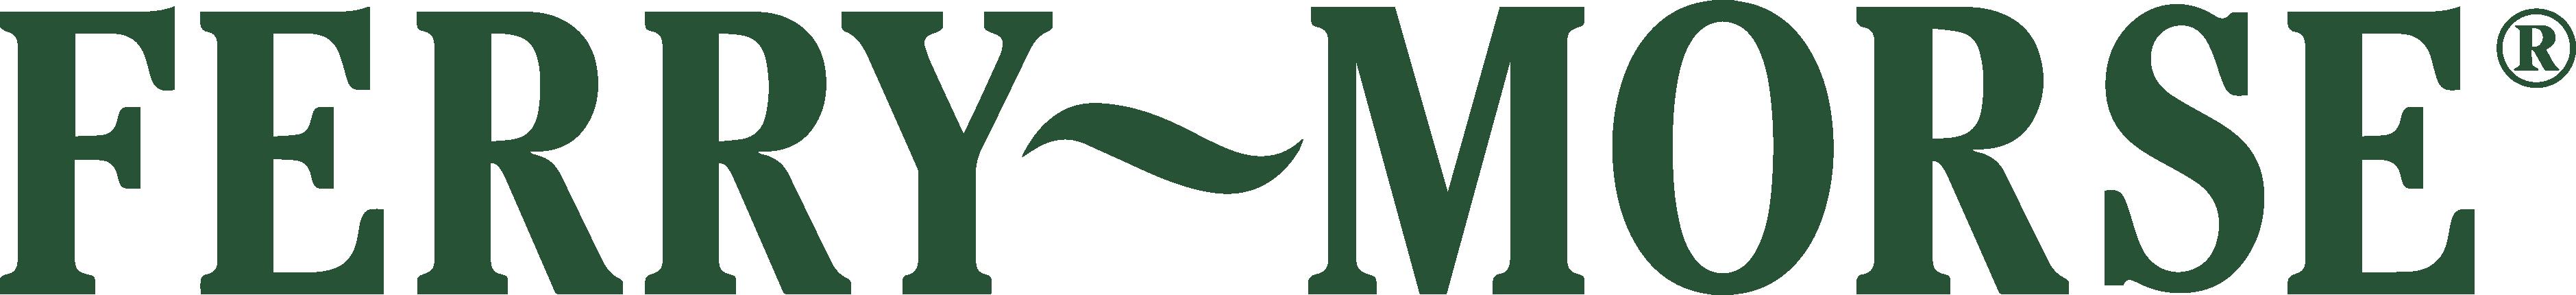 Ferry Morse Logo